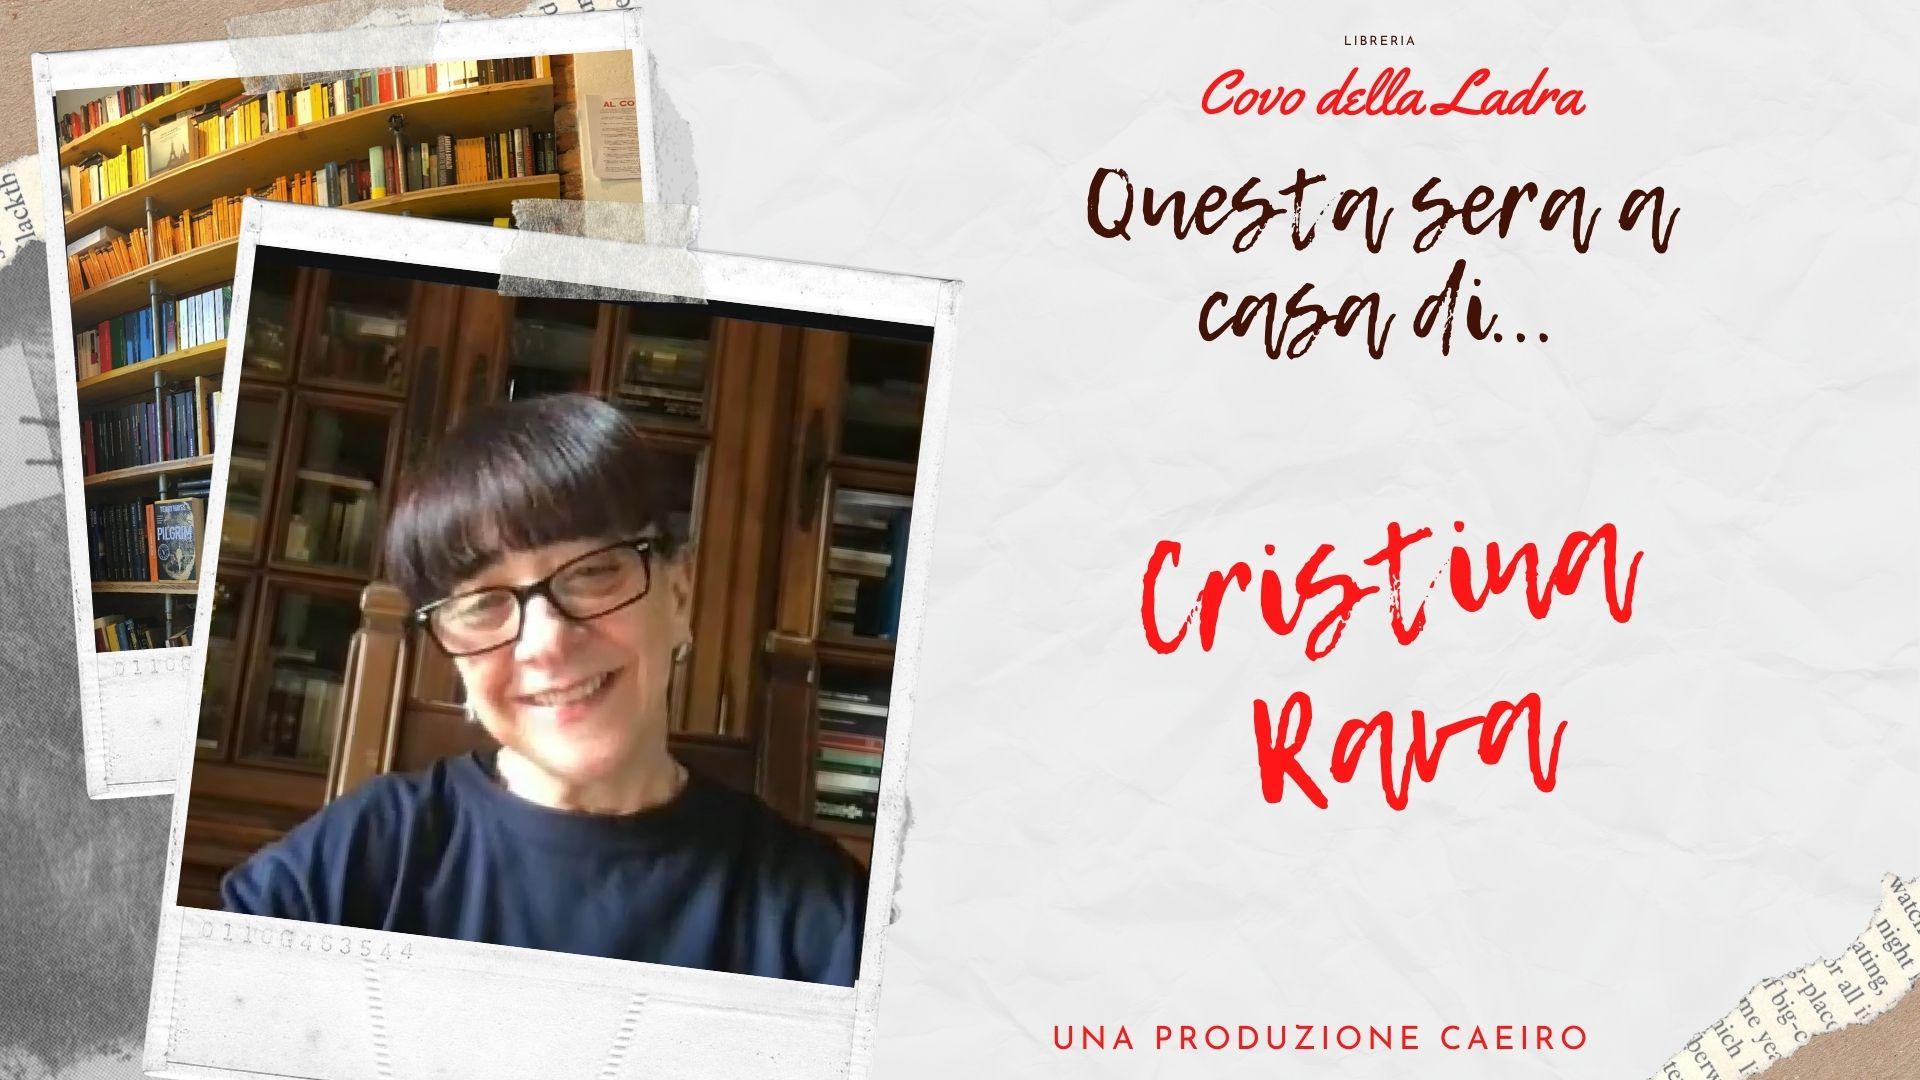 Questa sera a casa di Cristina Rava